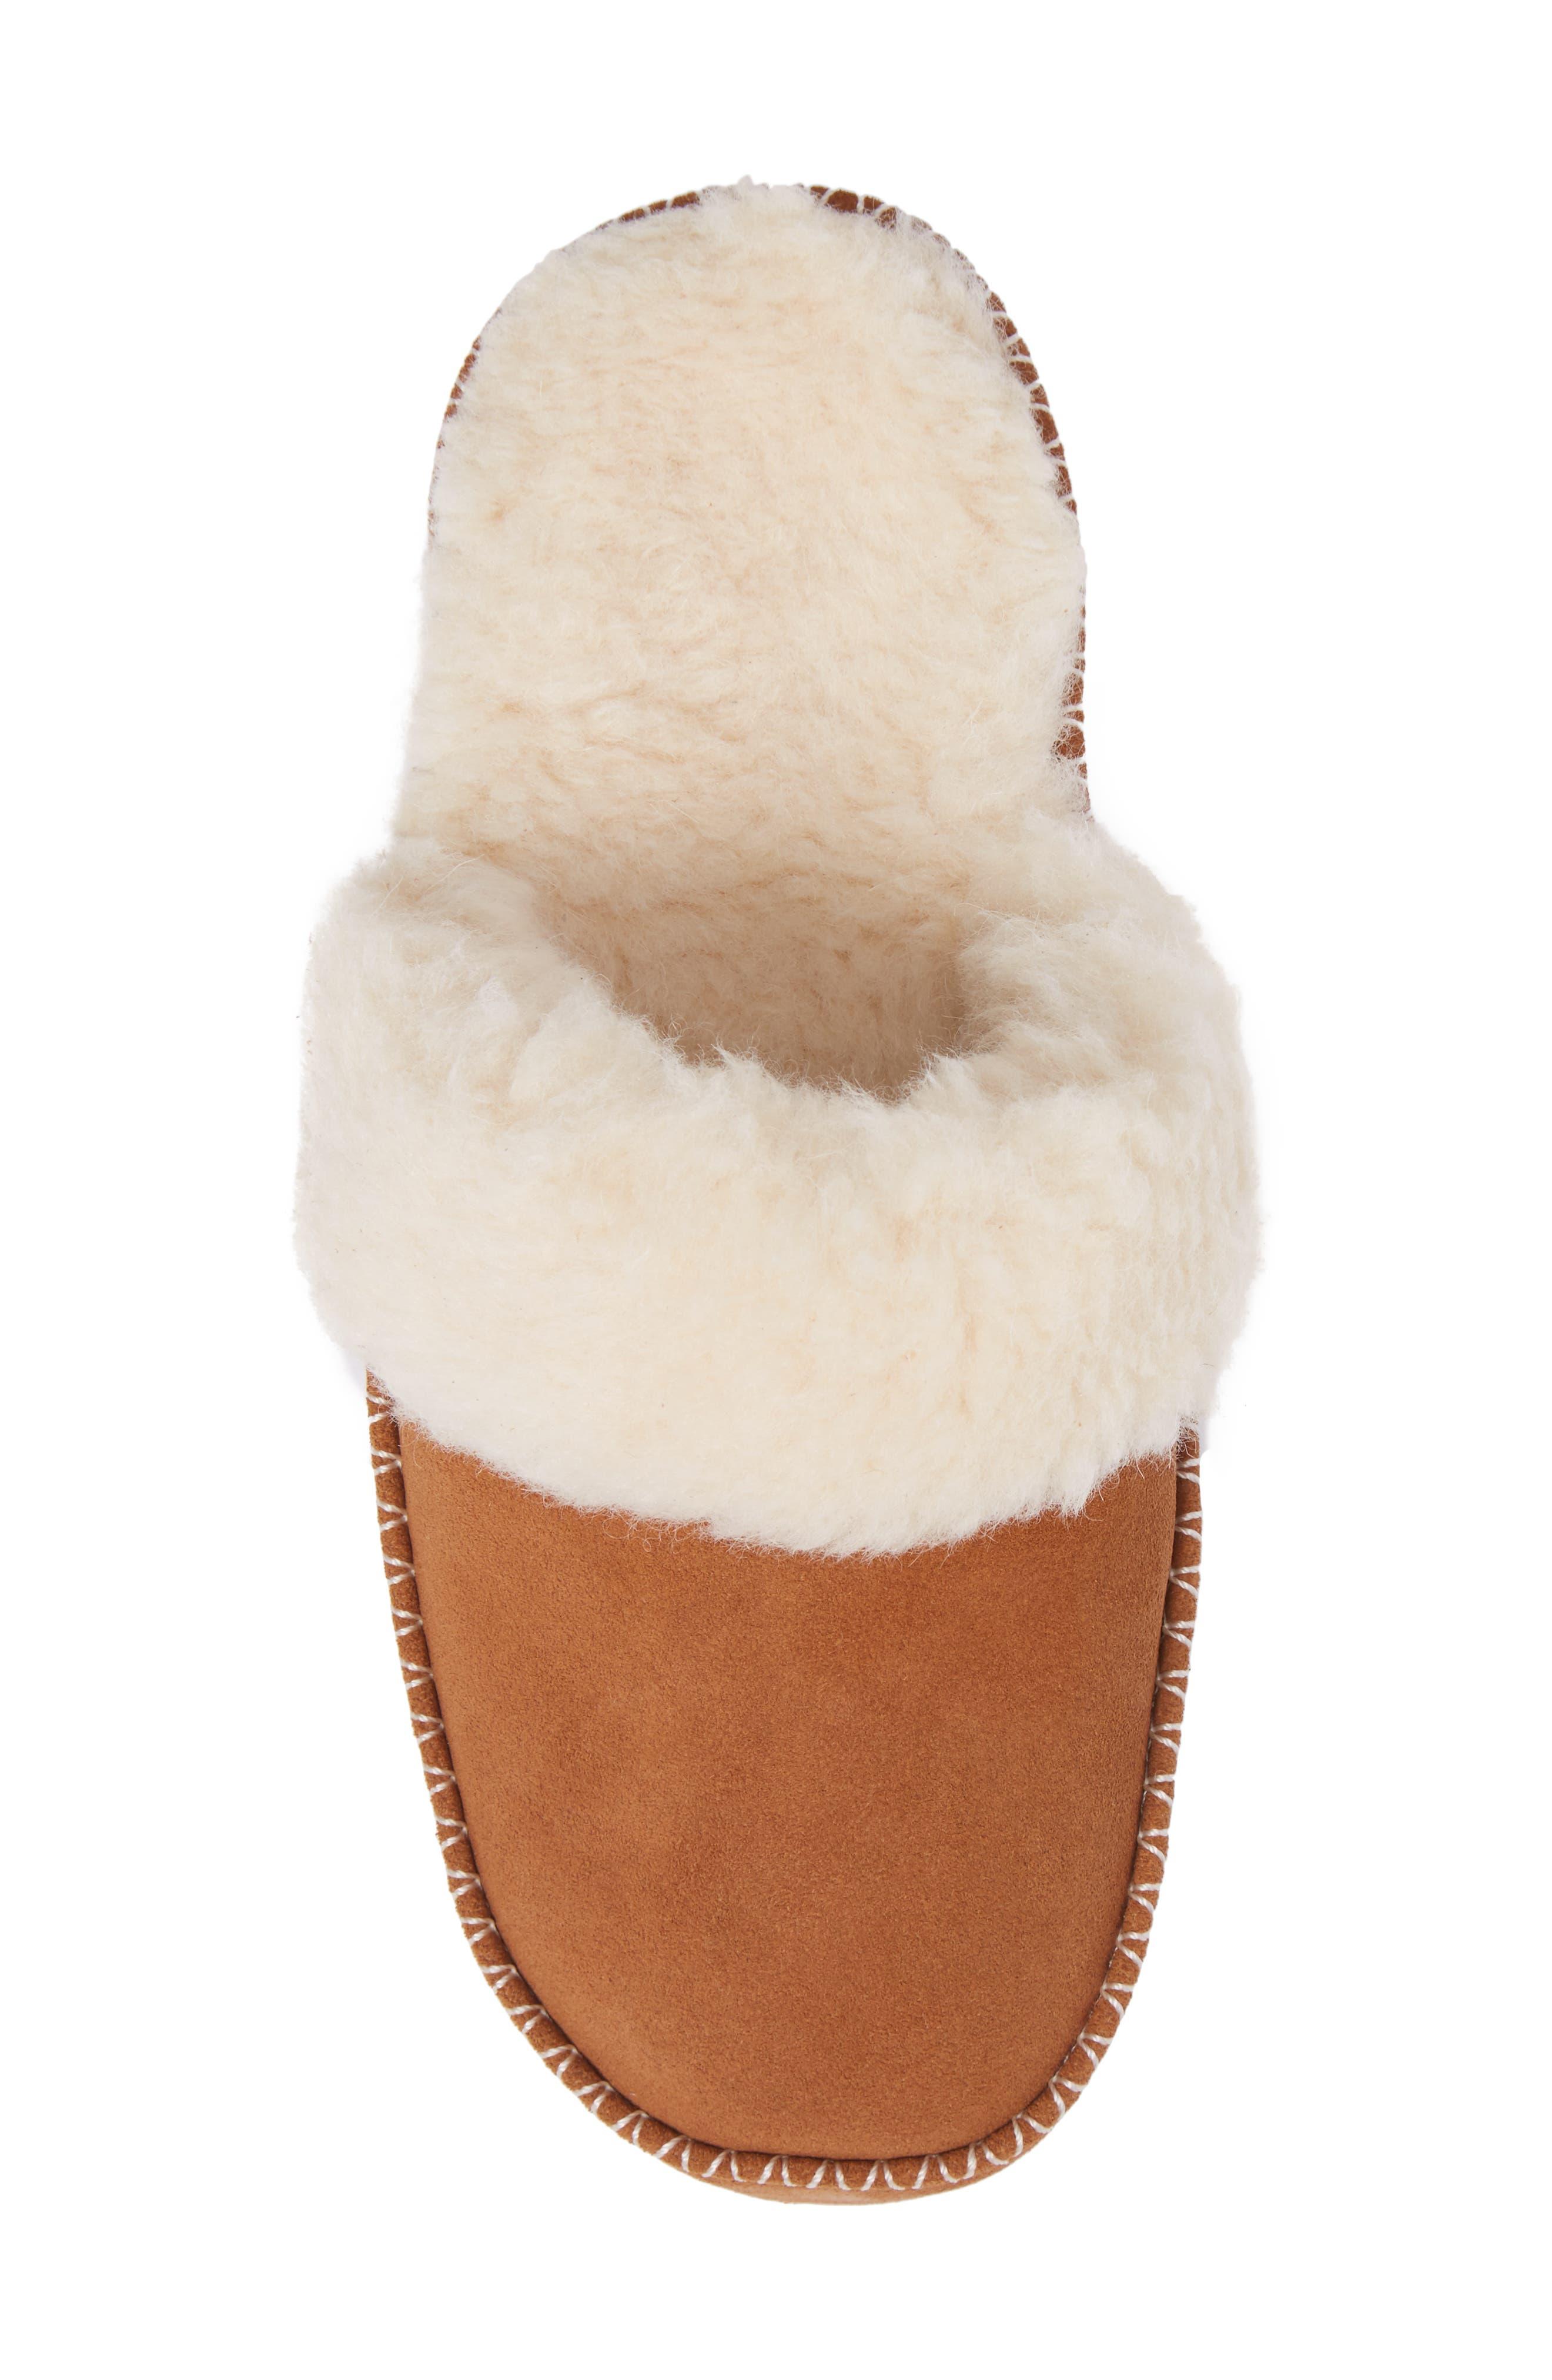 Marley Faux Fur Slipper,                             Alternate thumbnail 5, color,                             Chestnut Suede